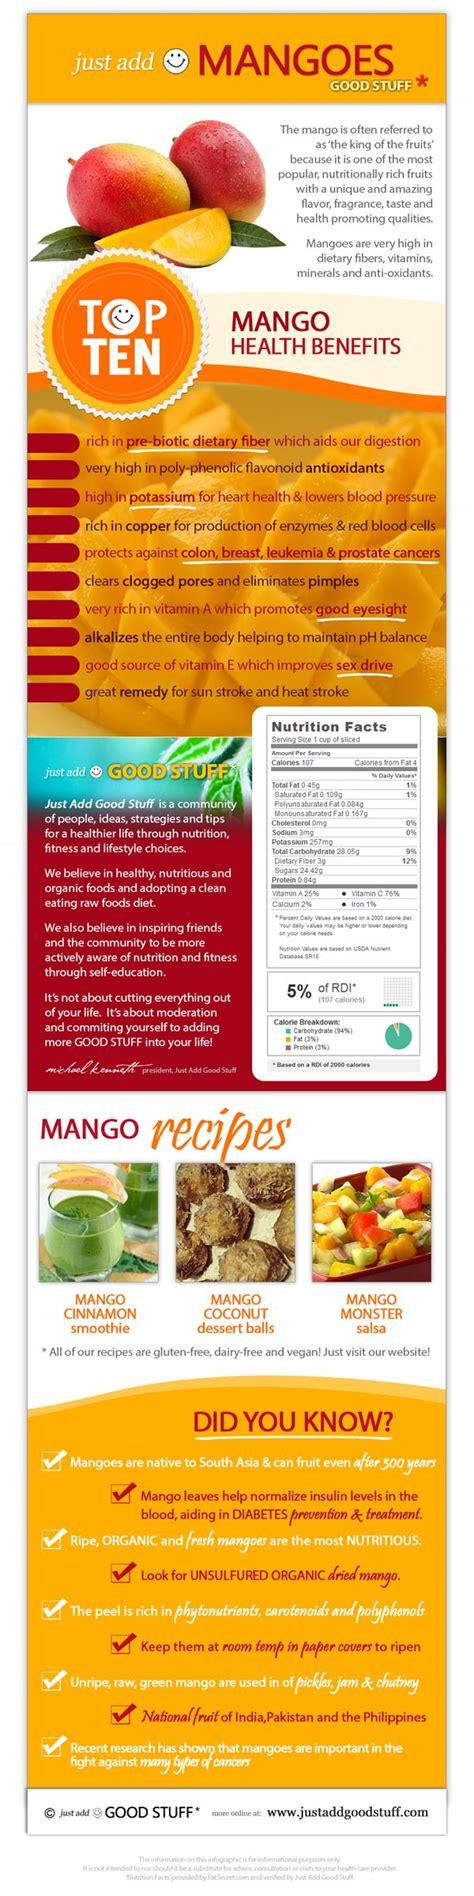 mango diet picture 5